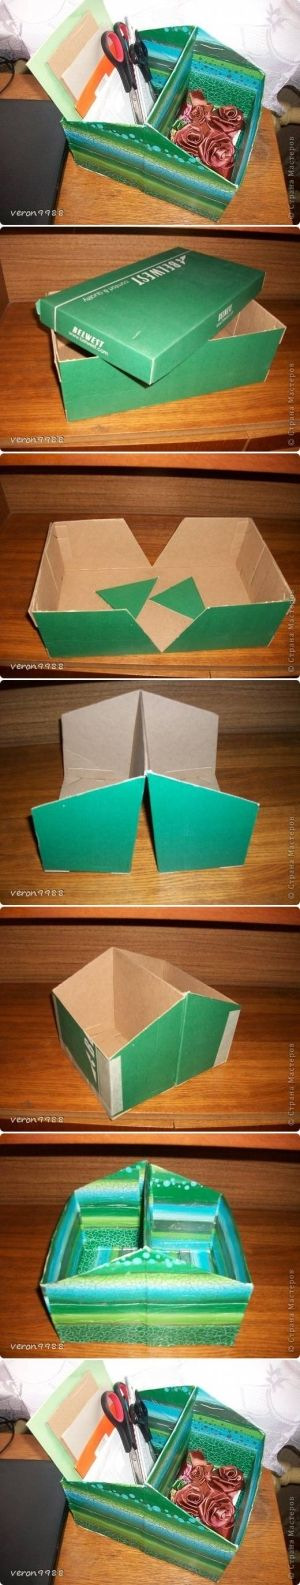 Shoe Box bricolage Organisateur Shoe Box bricolage Organisateur par diyforever